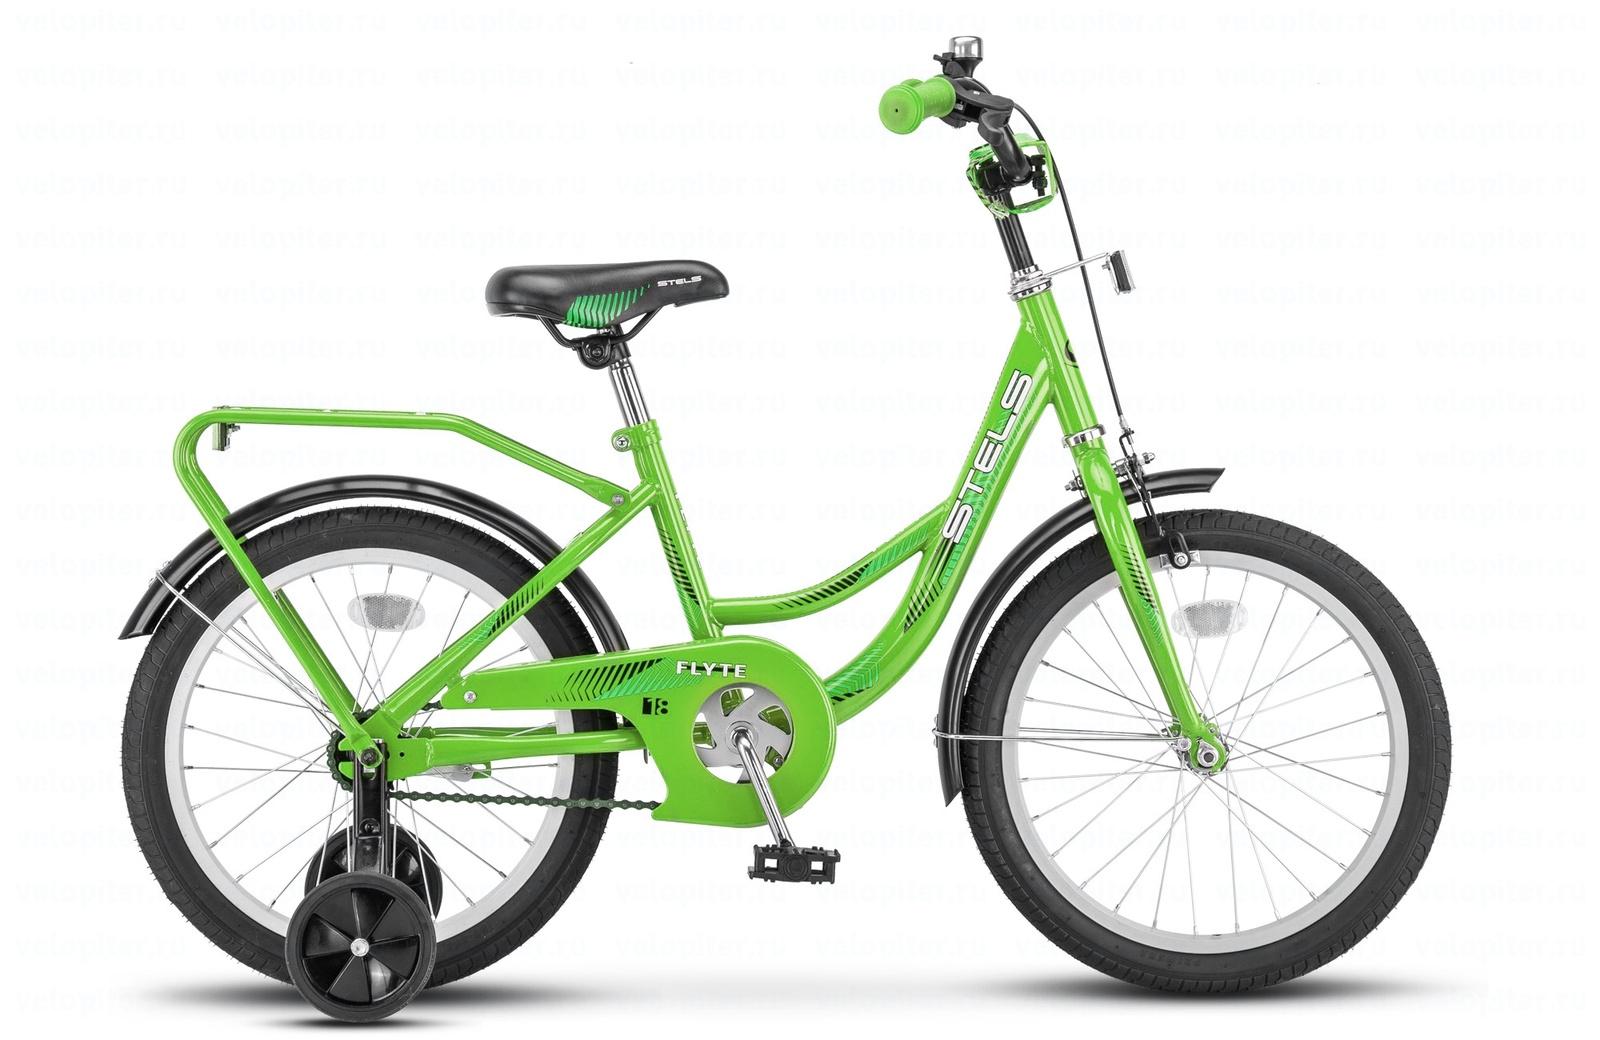 Велосипед STELS Flyte 18 (Z011)